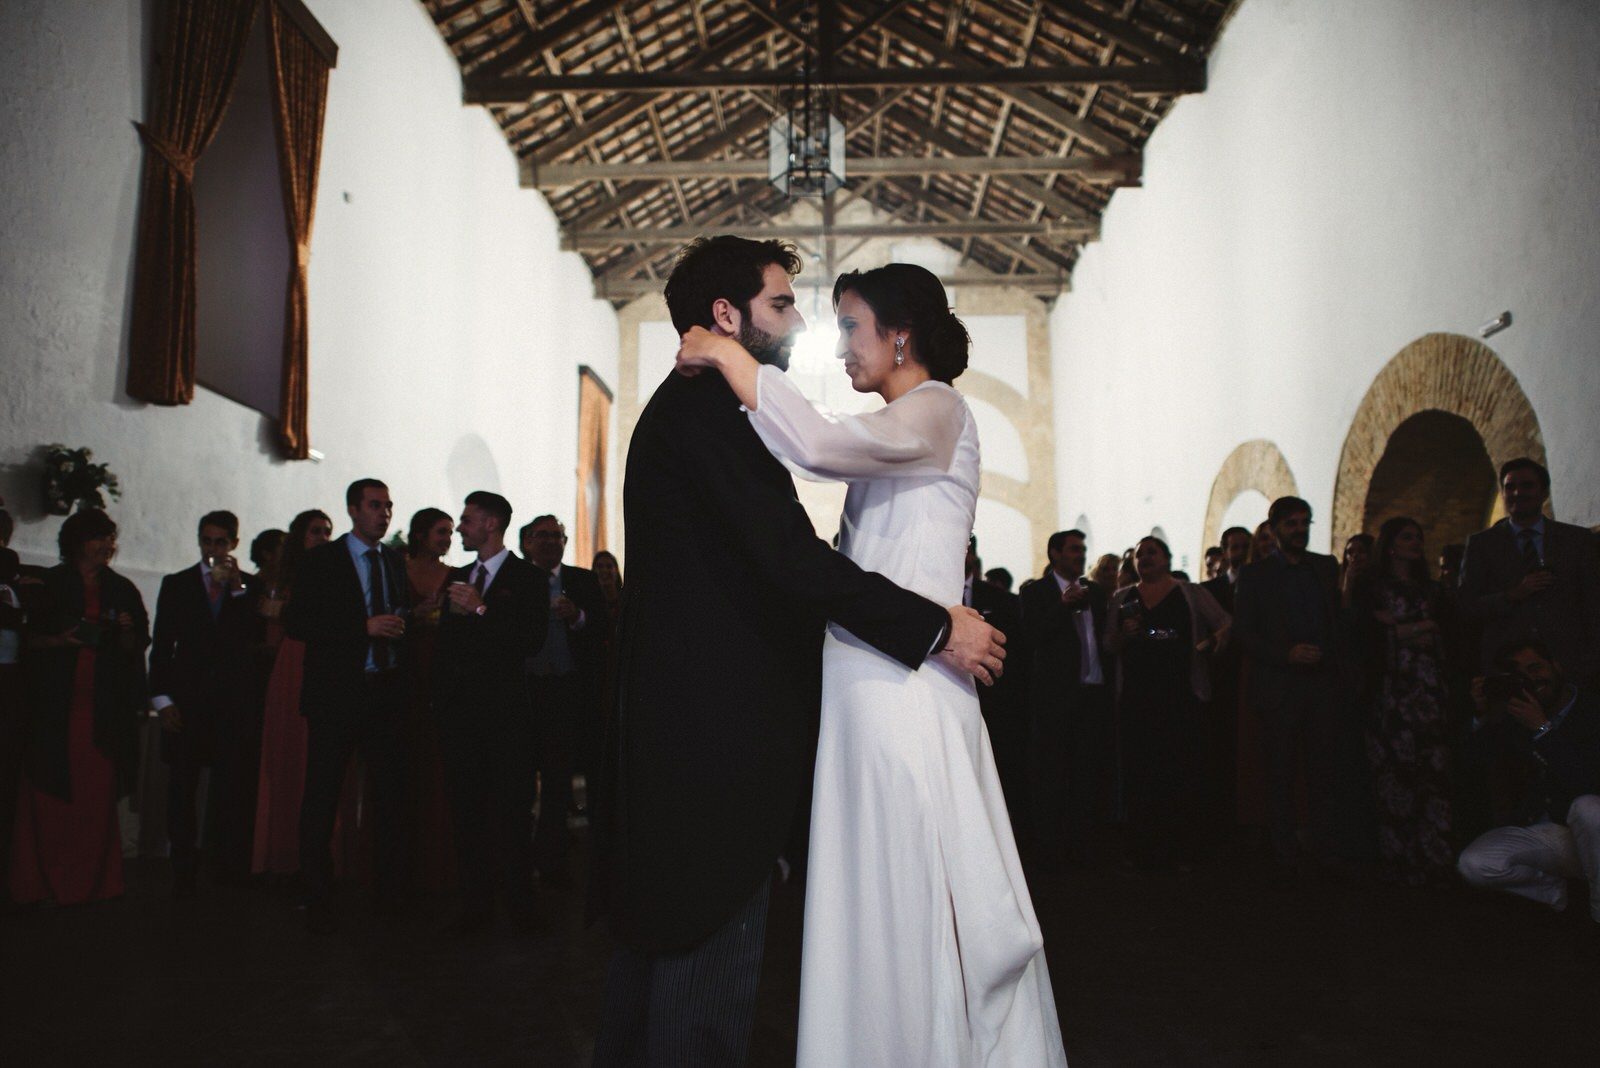 fotografo de bodas sevilla - fotografo boda - fotografía sevilla - Andrés AmarilloAAA_3670- fine.JPG